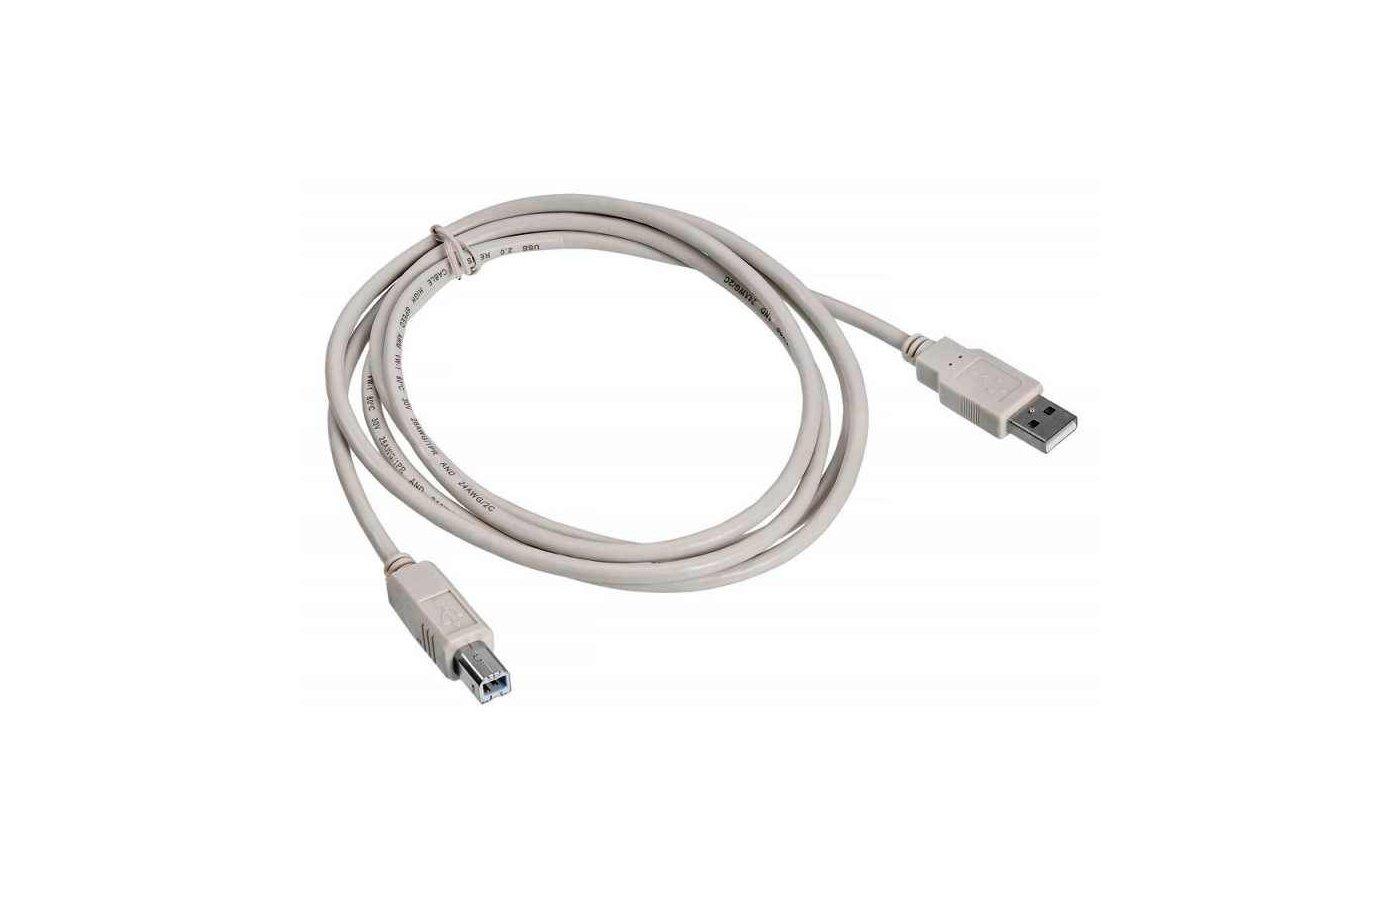 USB Кабель BURO USB 2.0 A(m) - B (m) 1.8м Медь (817258)